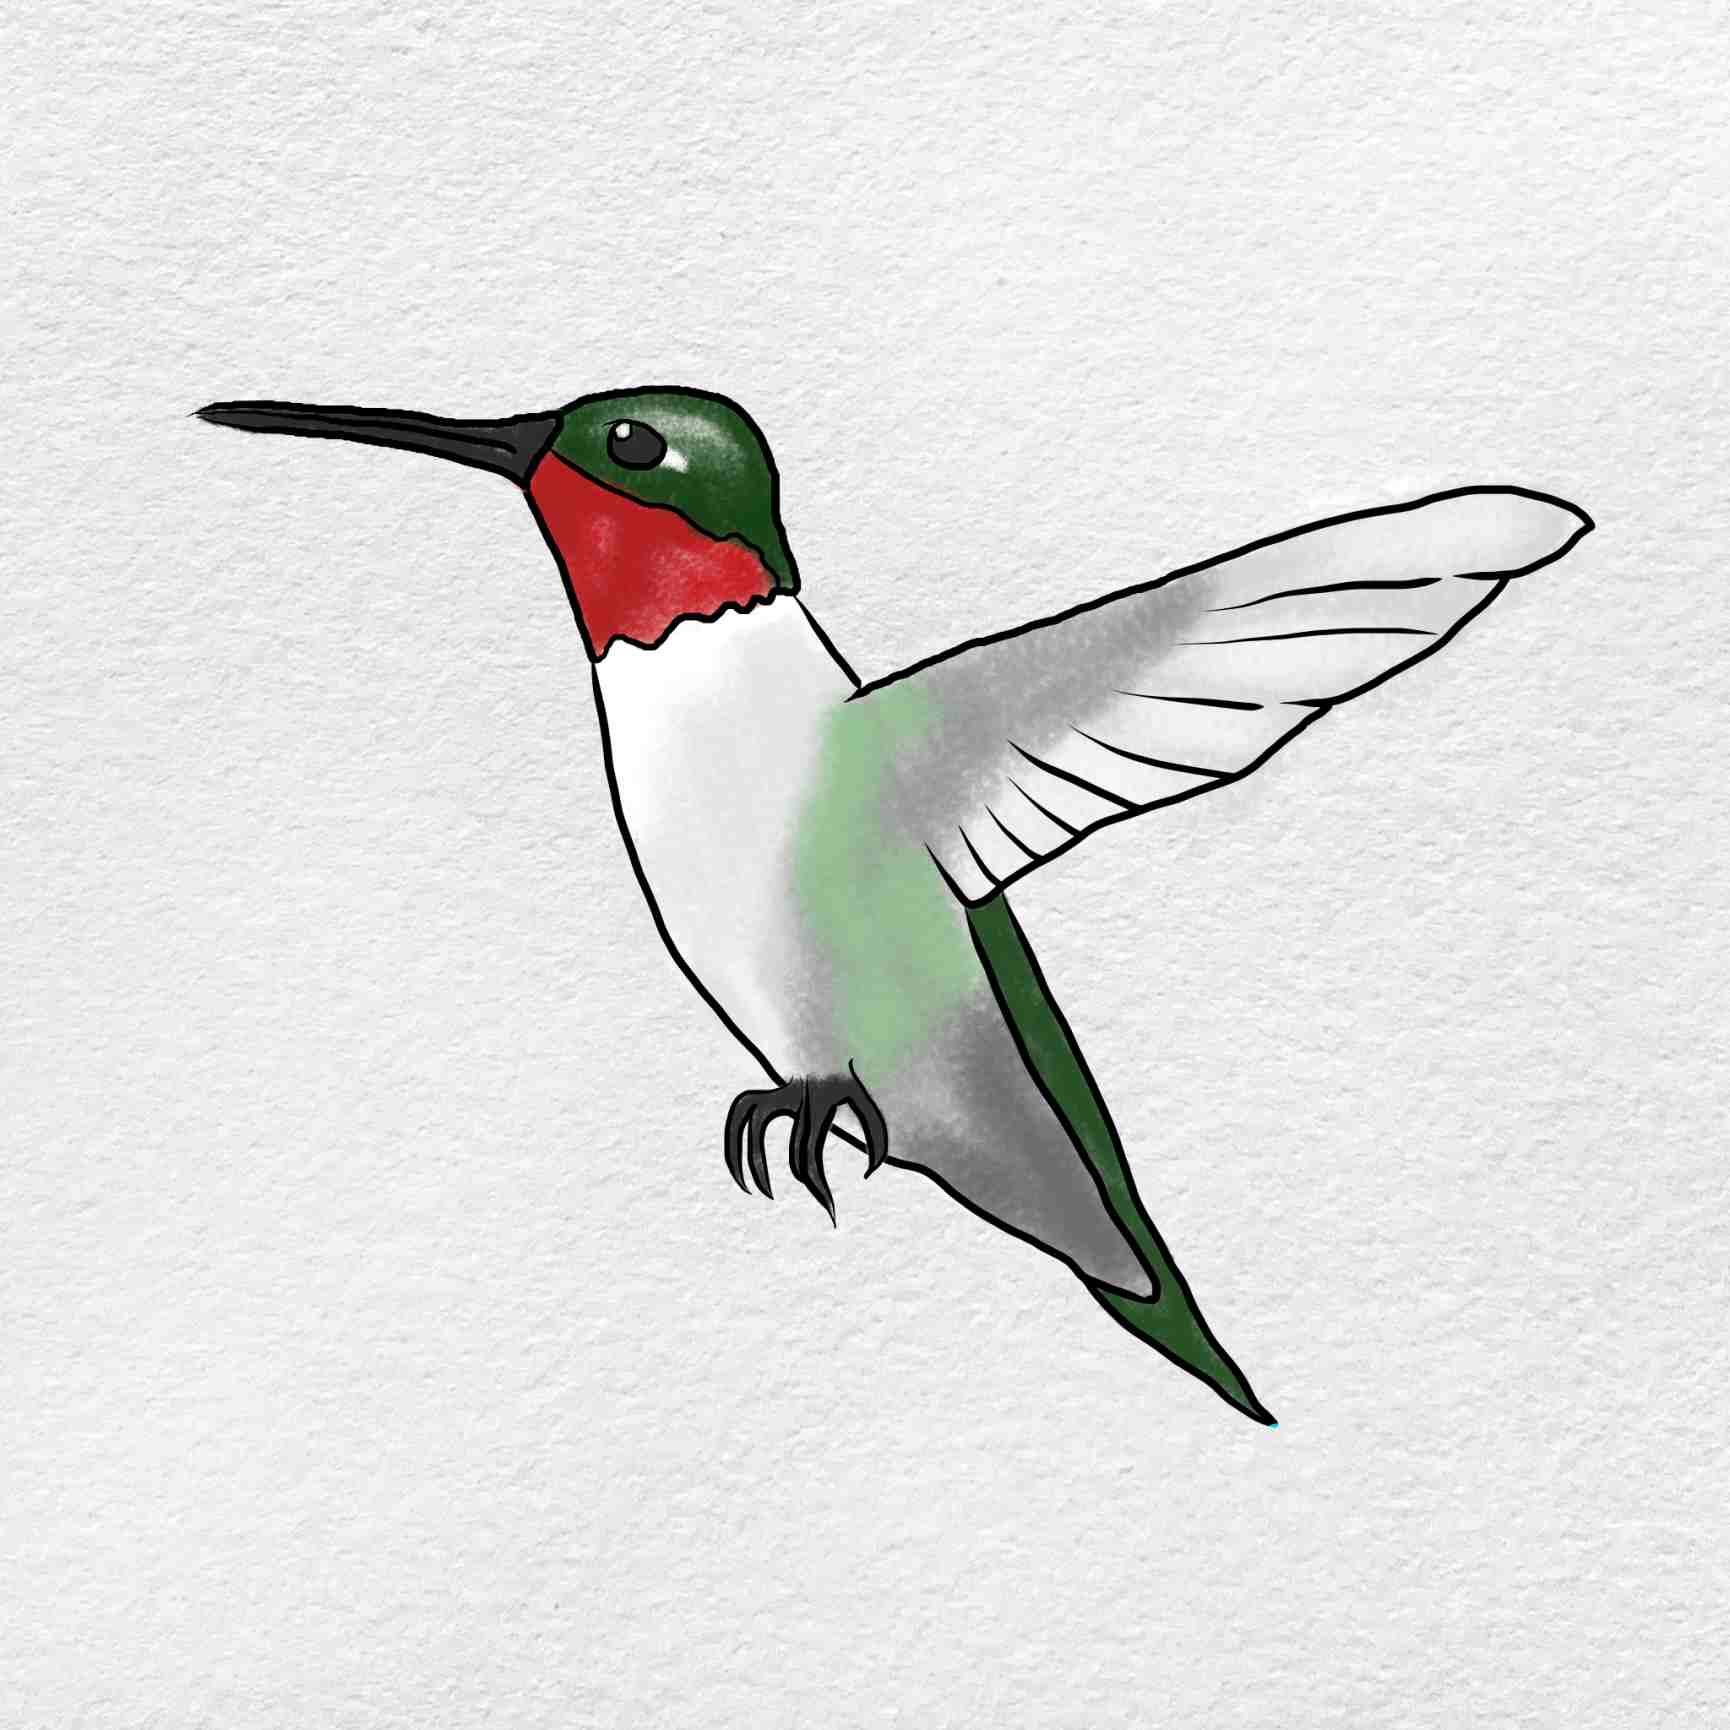 How To Draw Hummingbird: Step 6